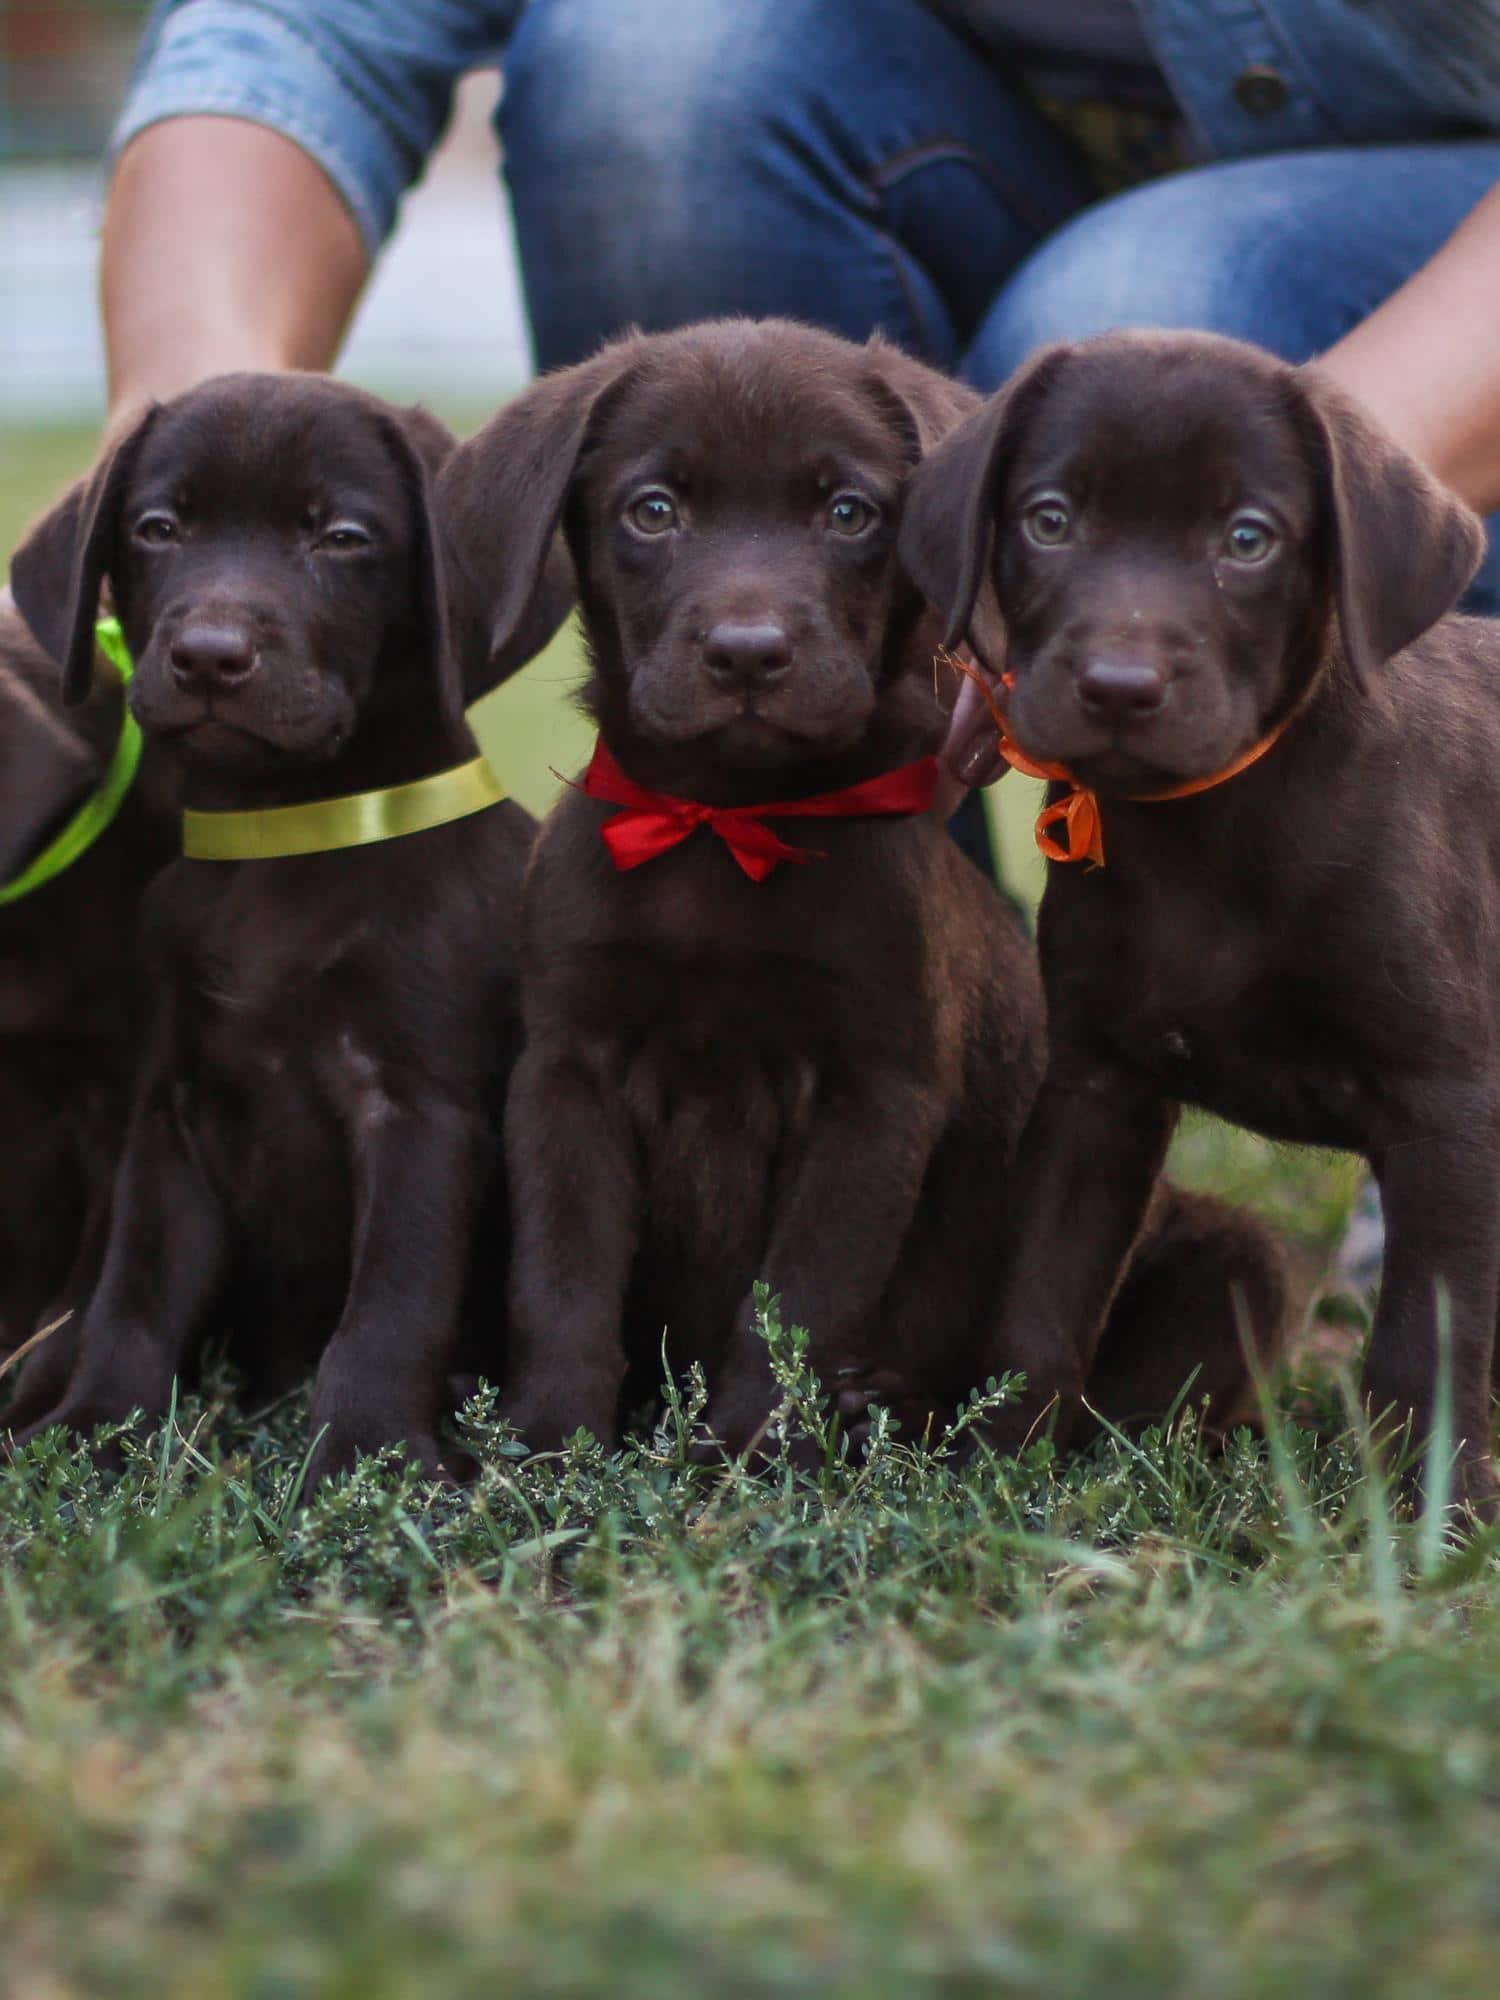 Labrador Welpen - so findest Du gesunde Welpen in Deiner Nähe!